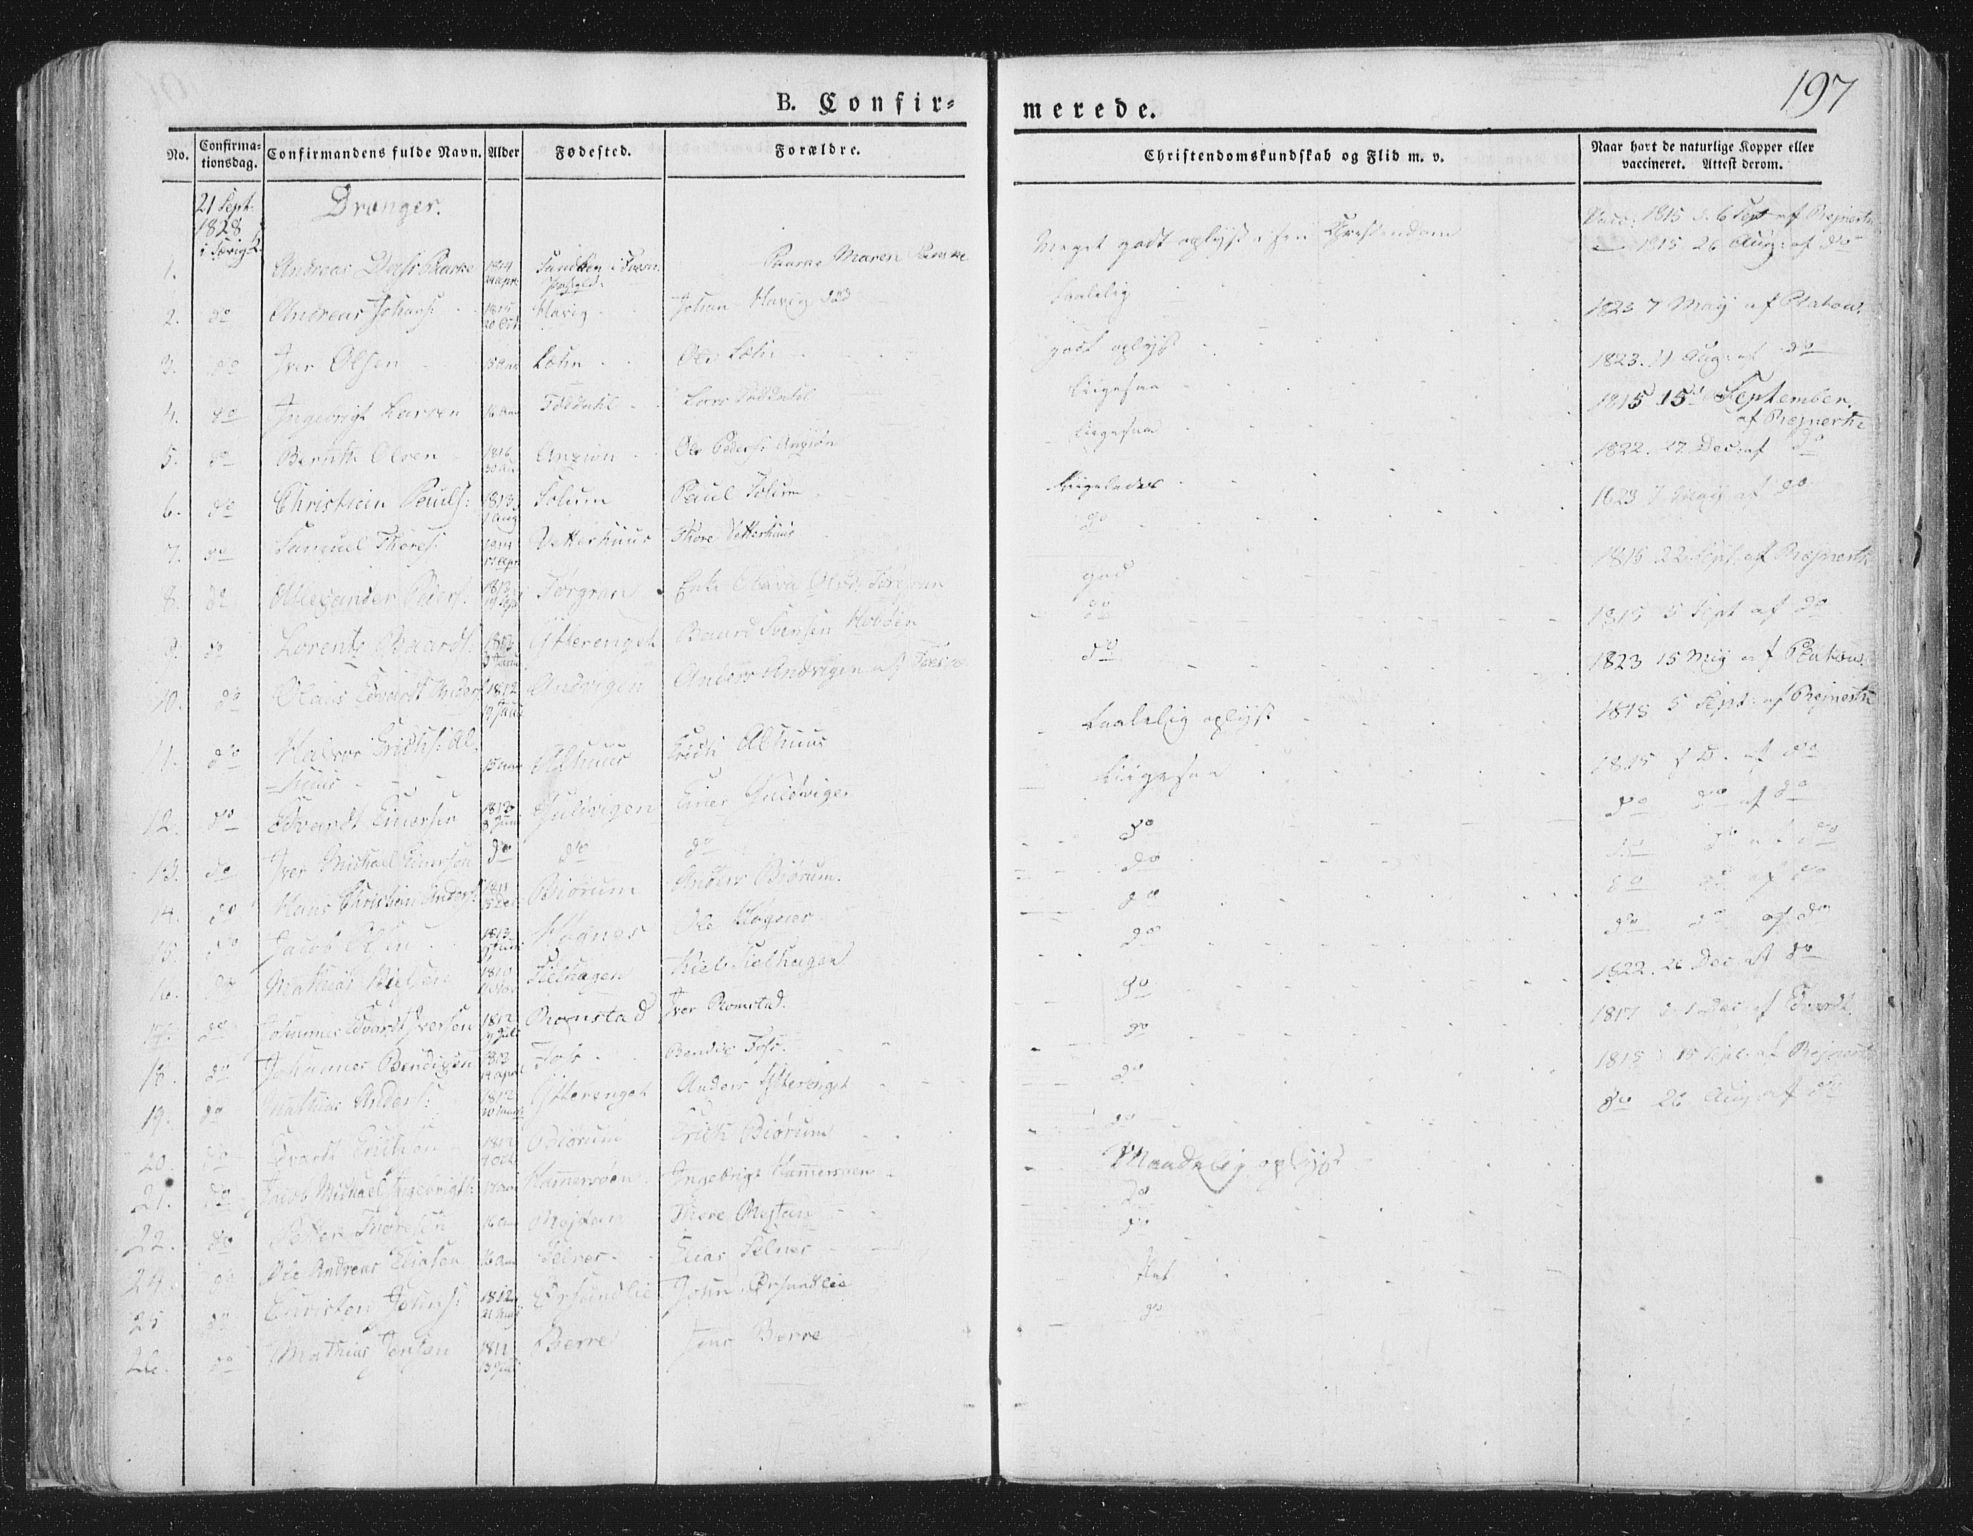 SAT, Ministerialprotokoller, klokkerbøker og fødselsregistre - Nord-Trøndelag, 764/L0551: Ministerialbok nr. 764A07a, 1824-1864, s. 197